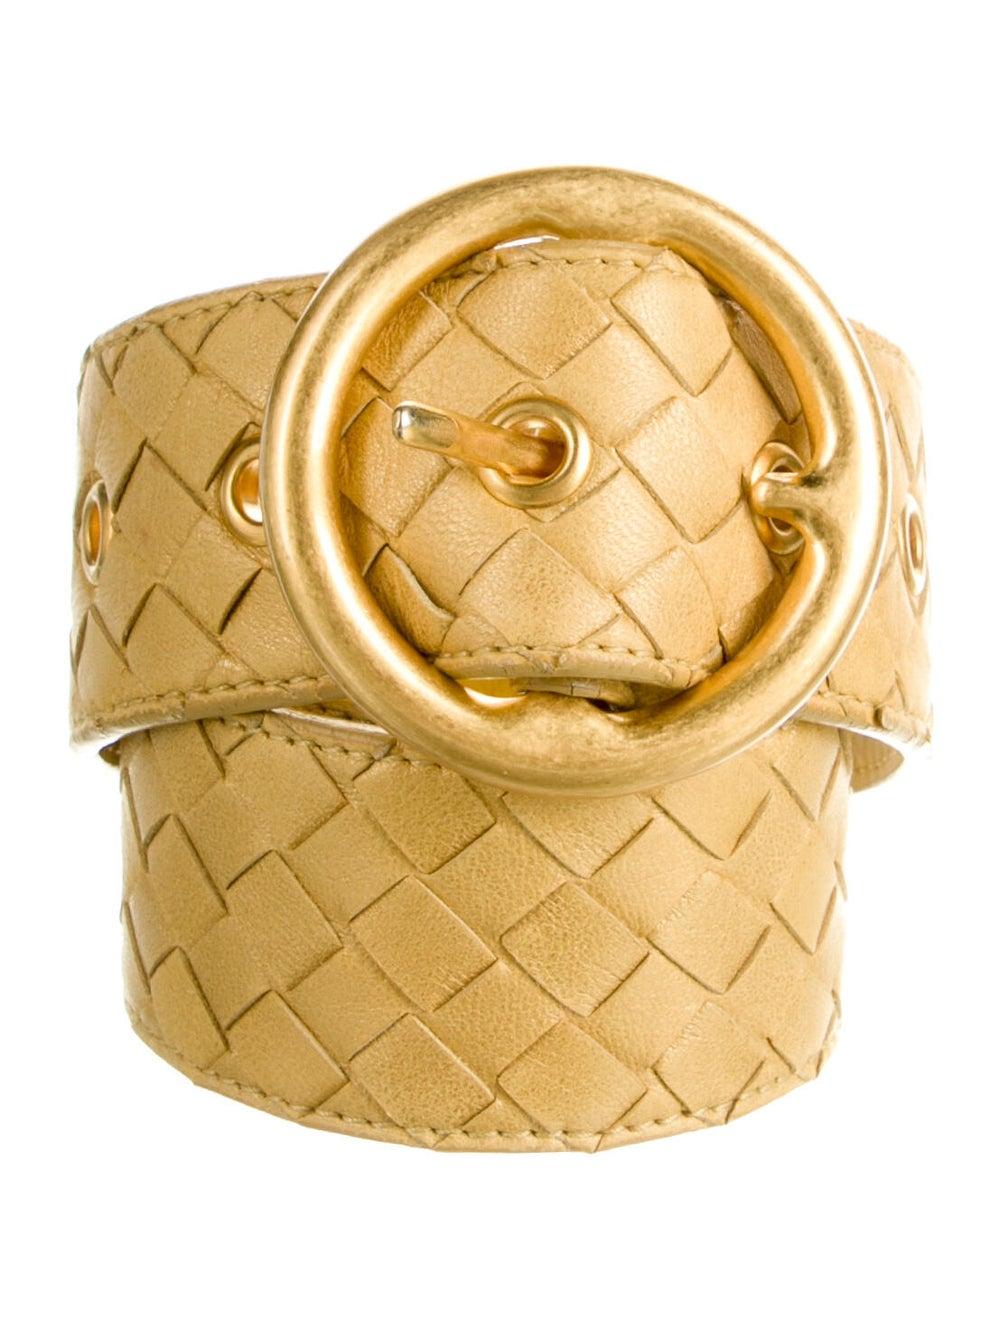 Bottega Veneta Intrecciato Weave Leather Waist Be… - image 1